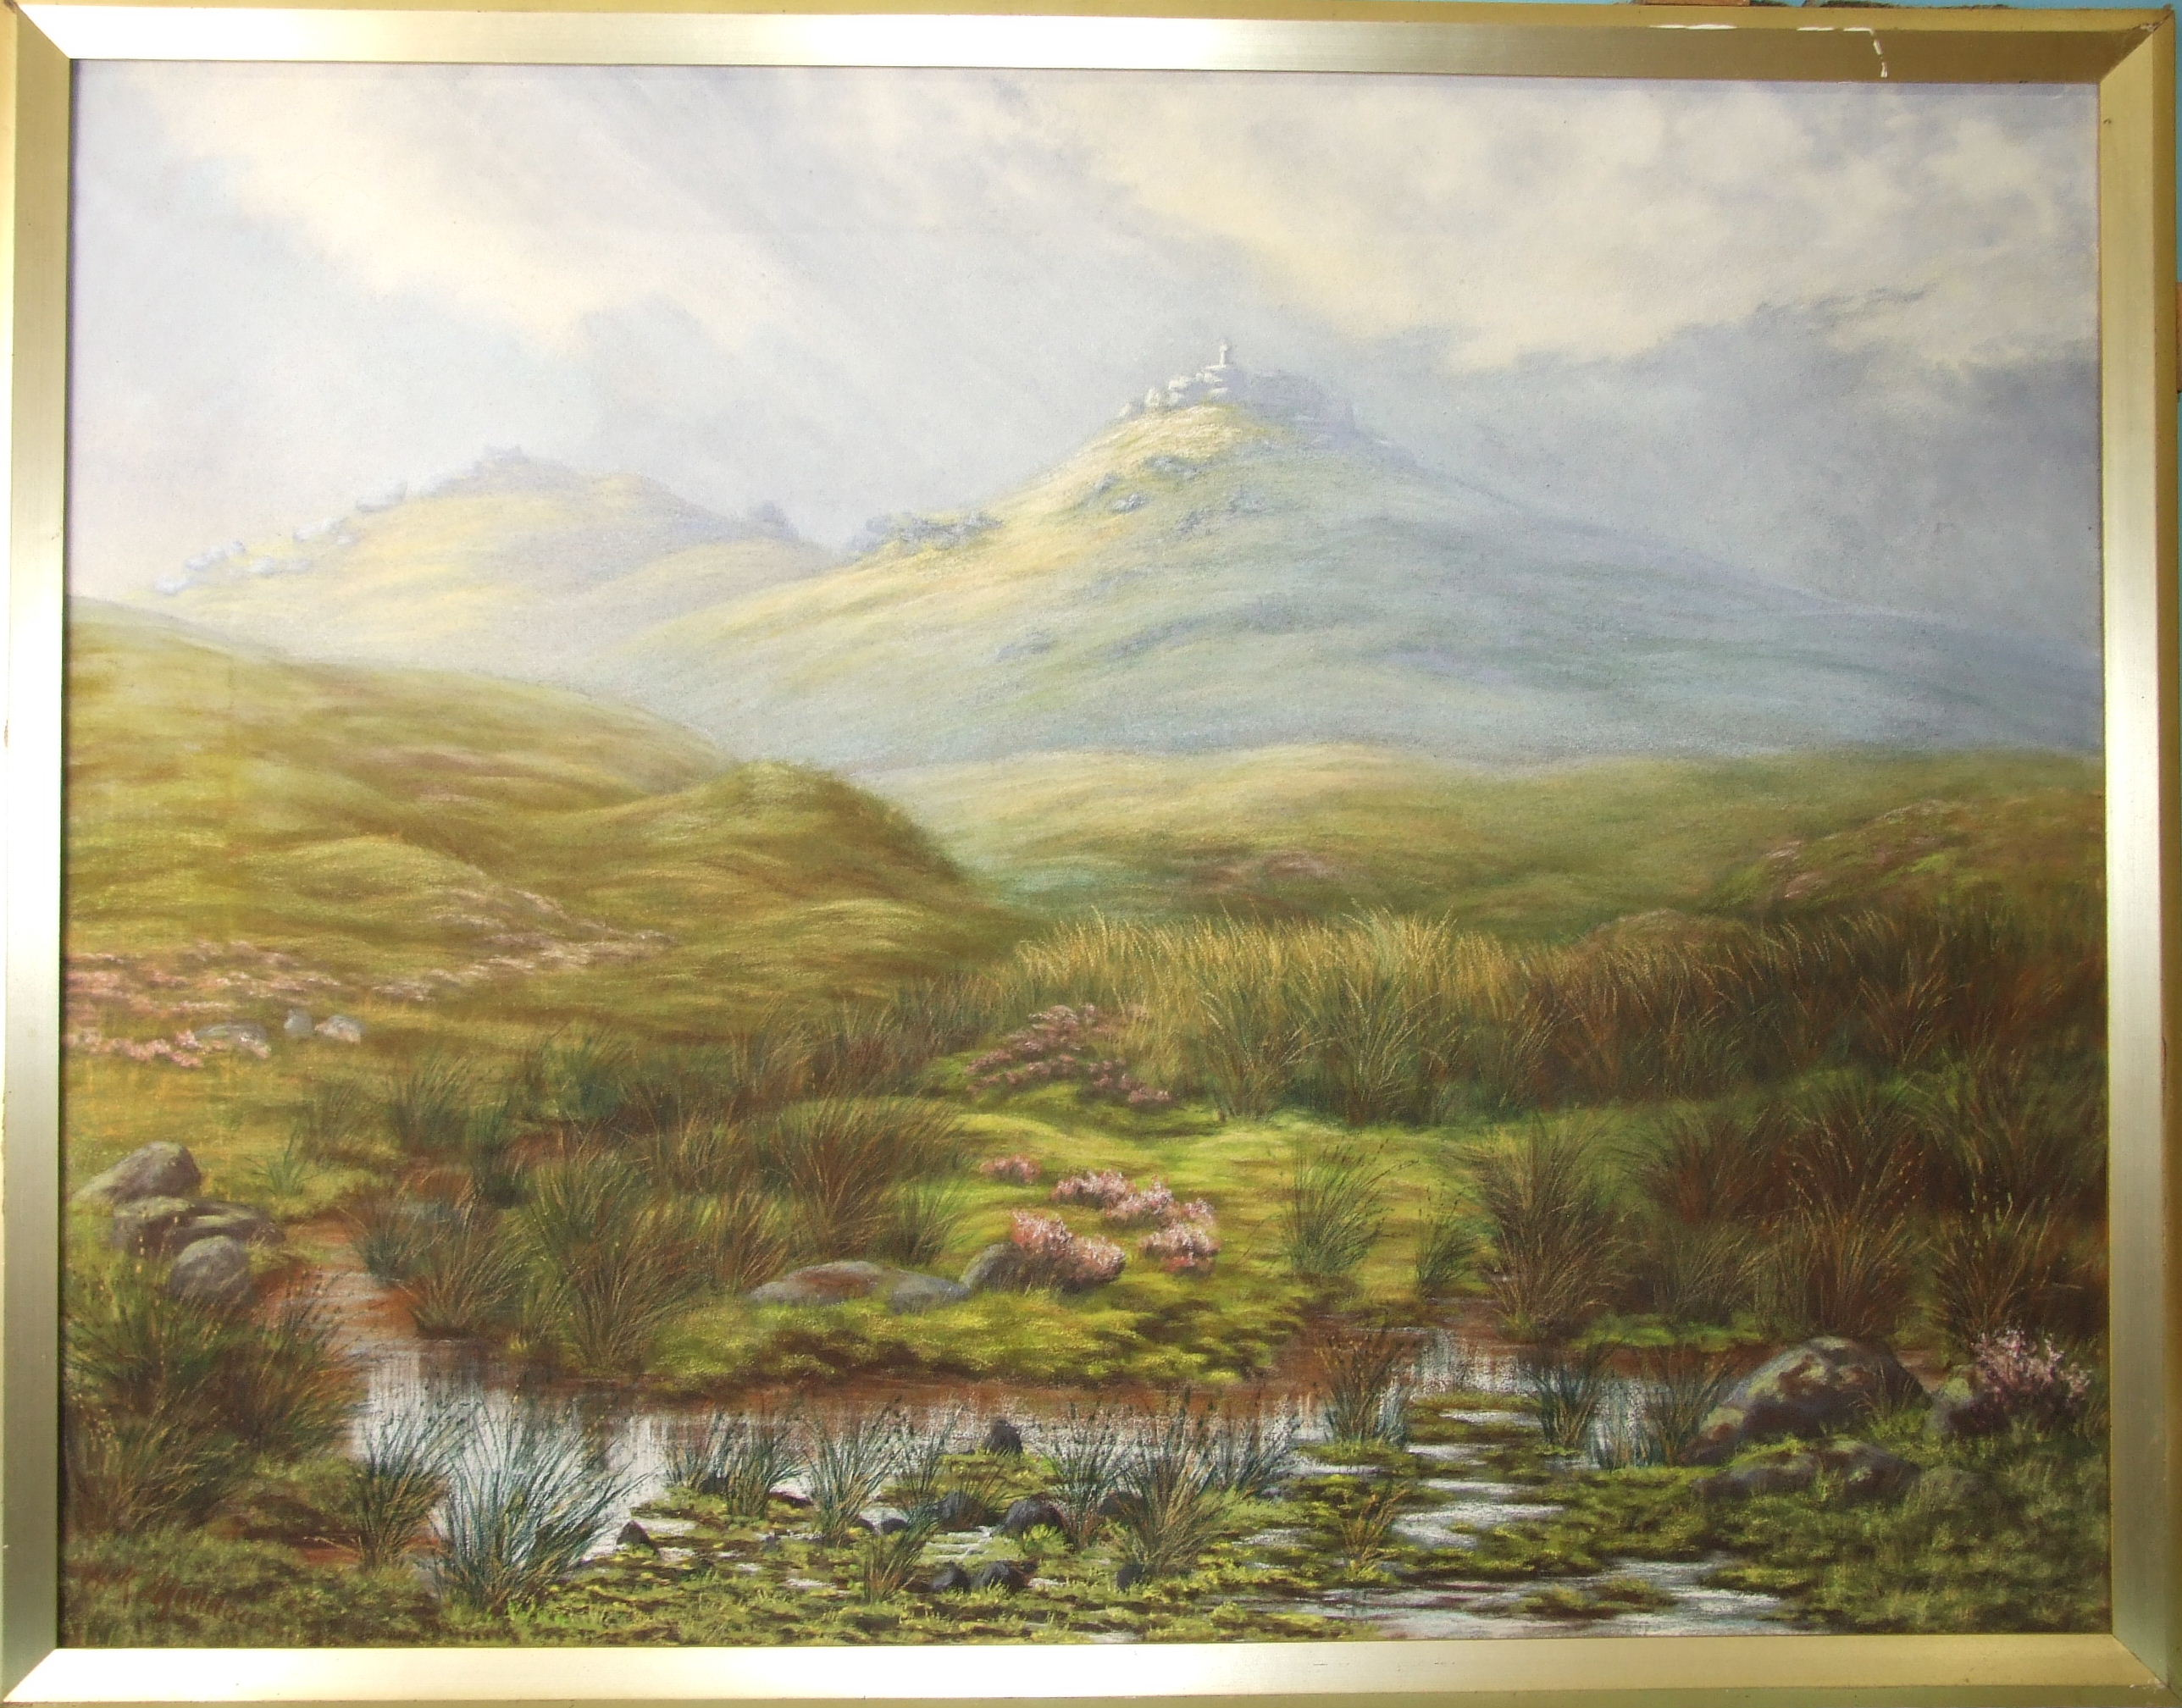 A K Meadows (19th/20th century), 'Looking towards Widgery Cross, Dartmoor', pastel, signed, 60 x